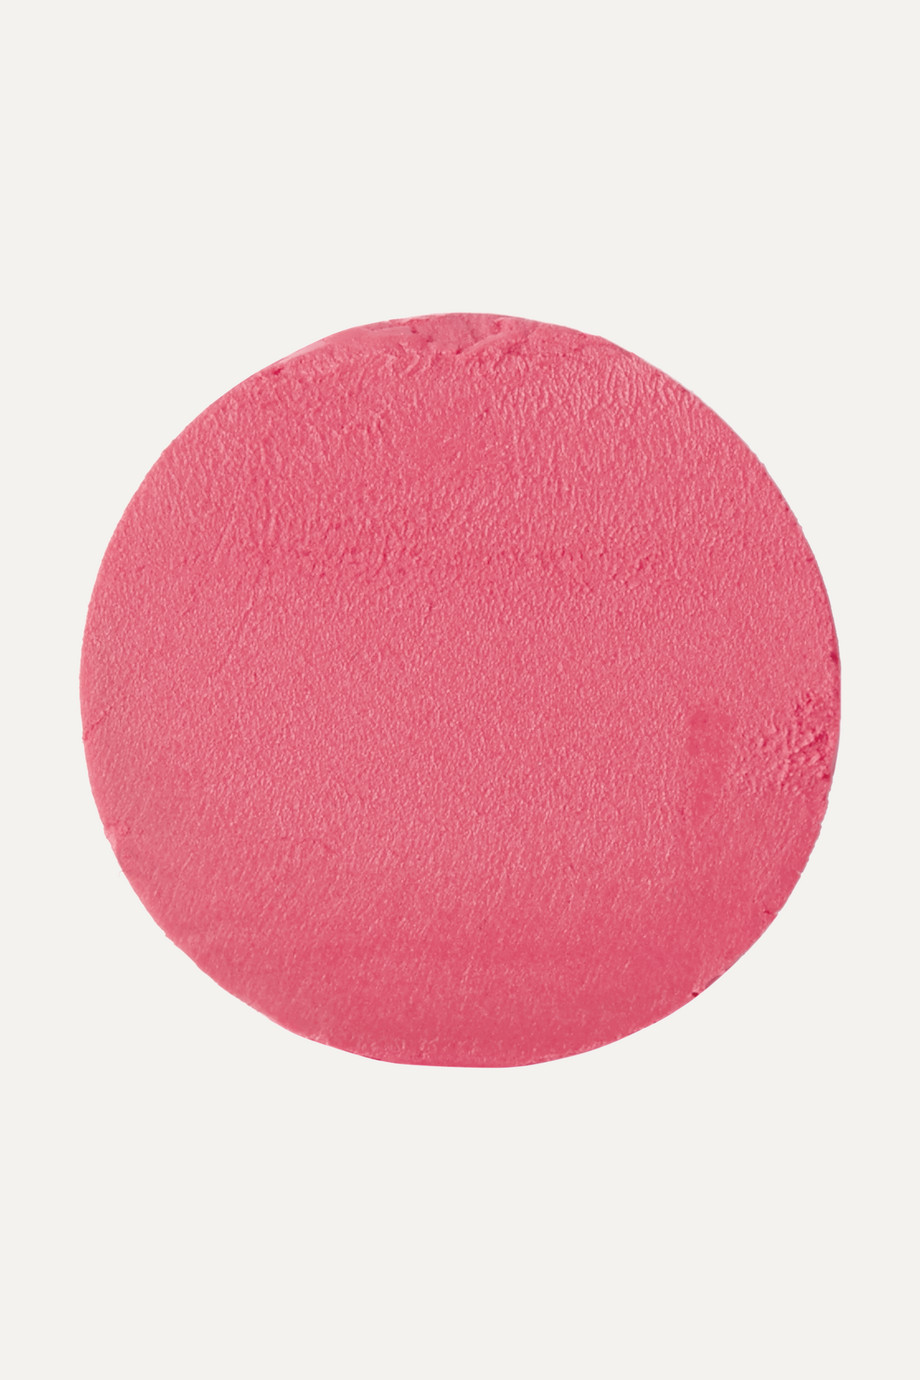 Charlotte Tilbury 传奇哑光唇膏(色号:Gracefully Pink)